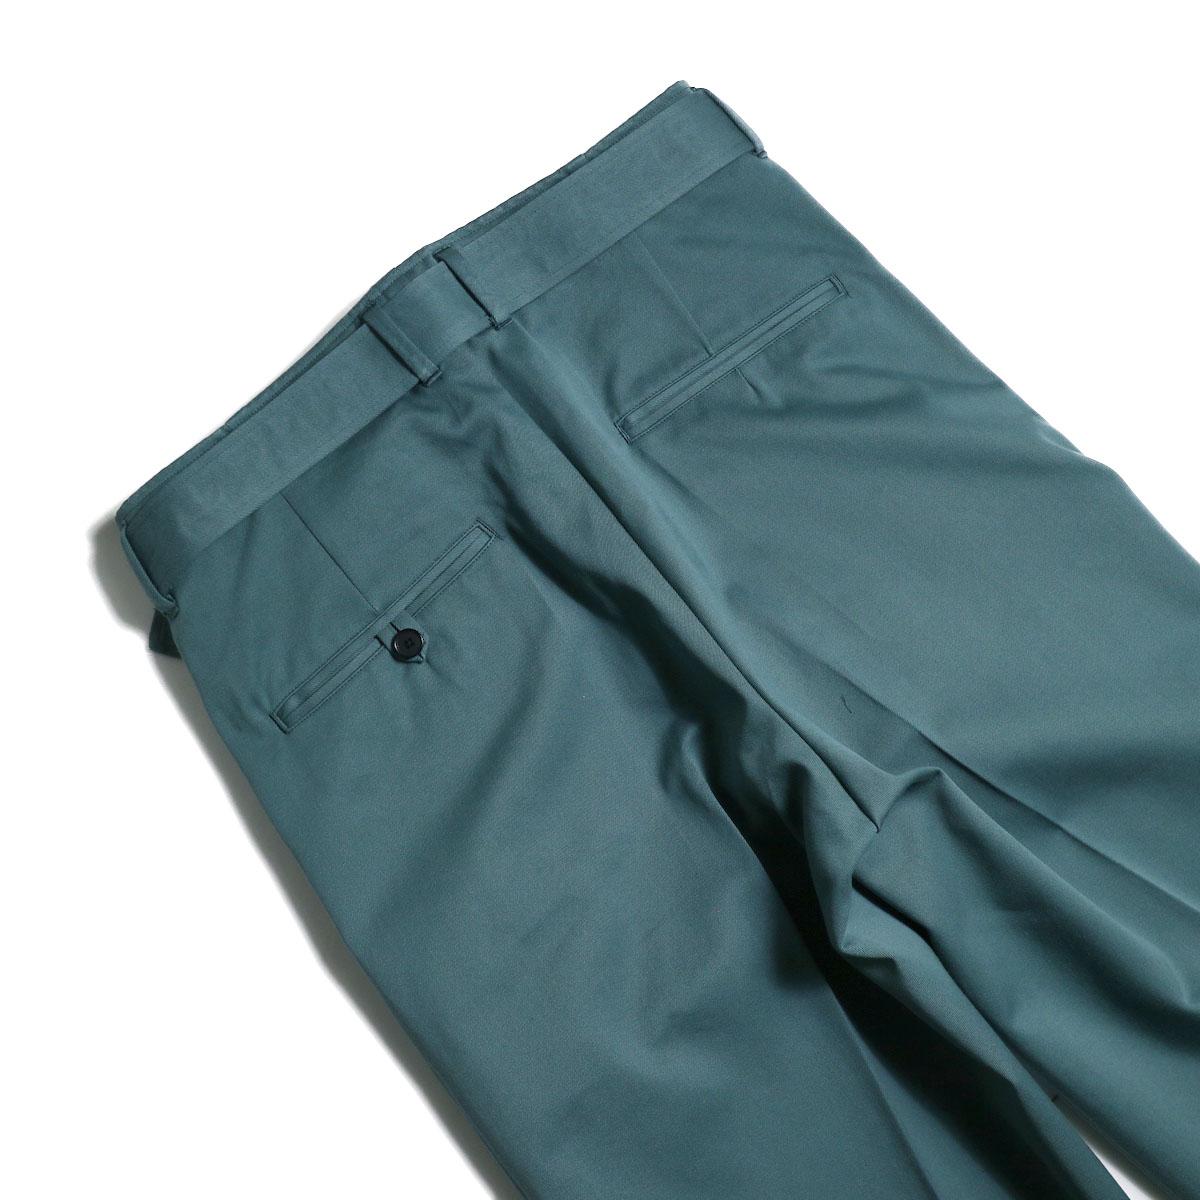 UNUSED / UW0840 Belted Pants (Green)ヒップポケット